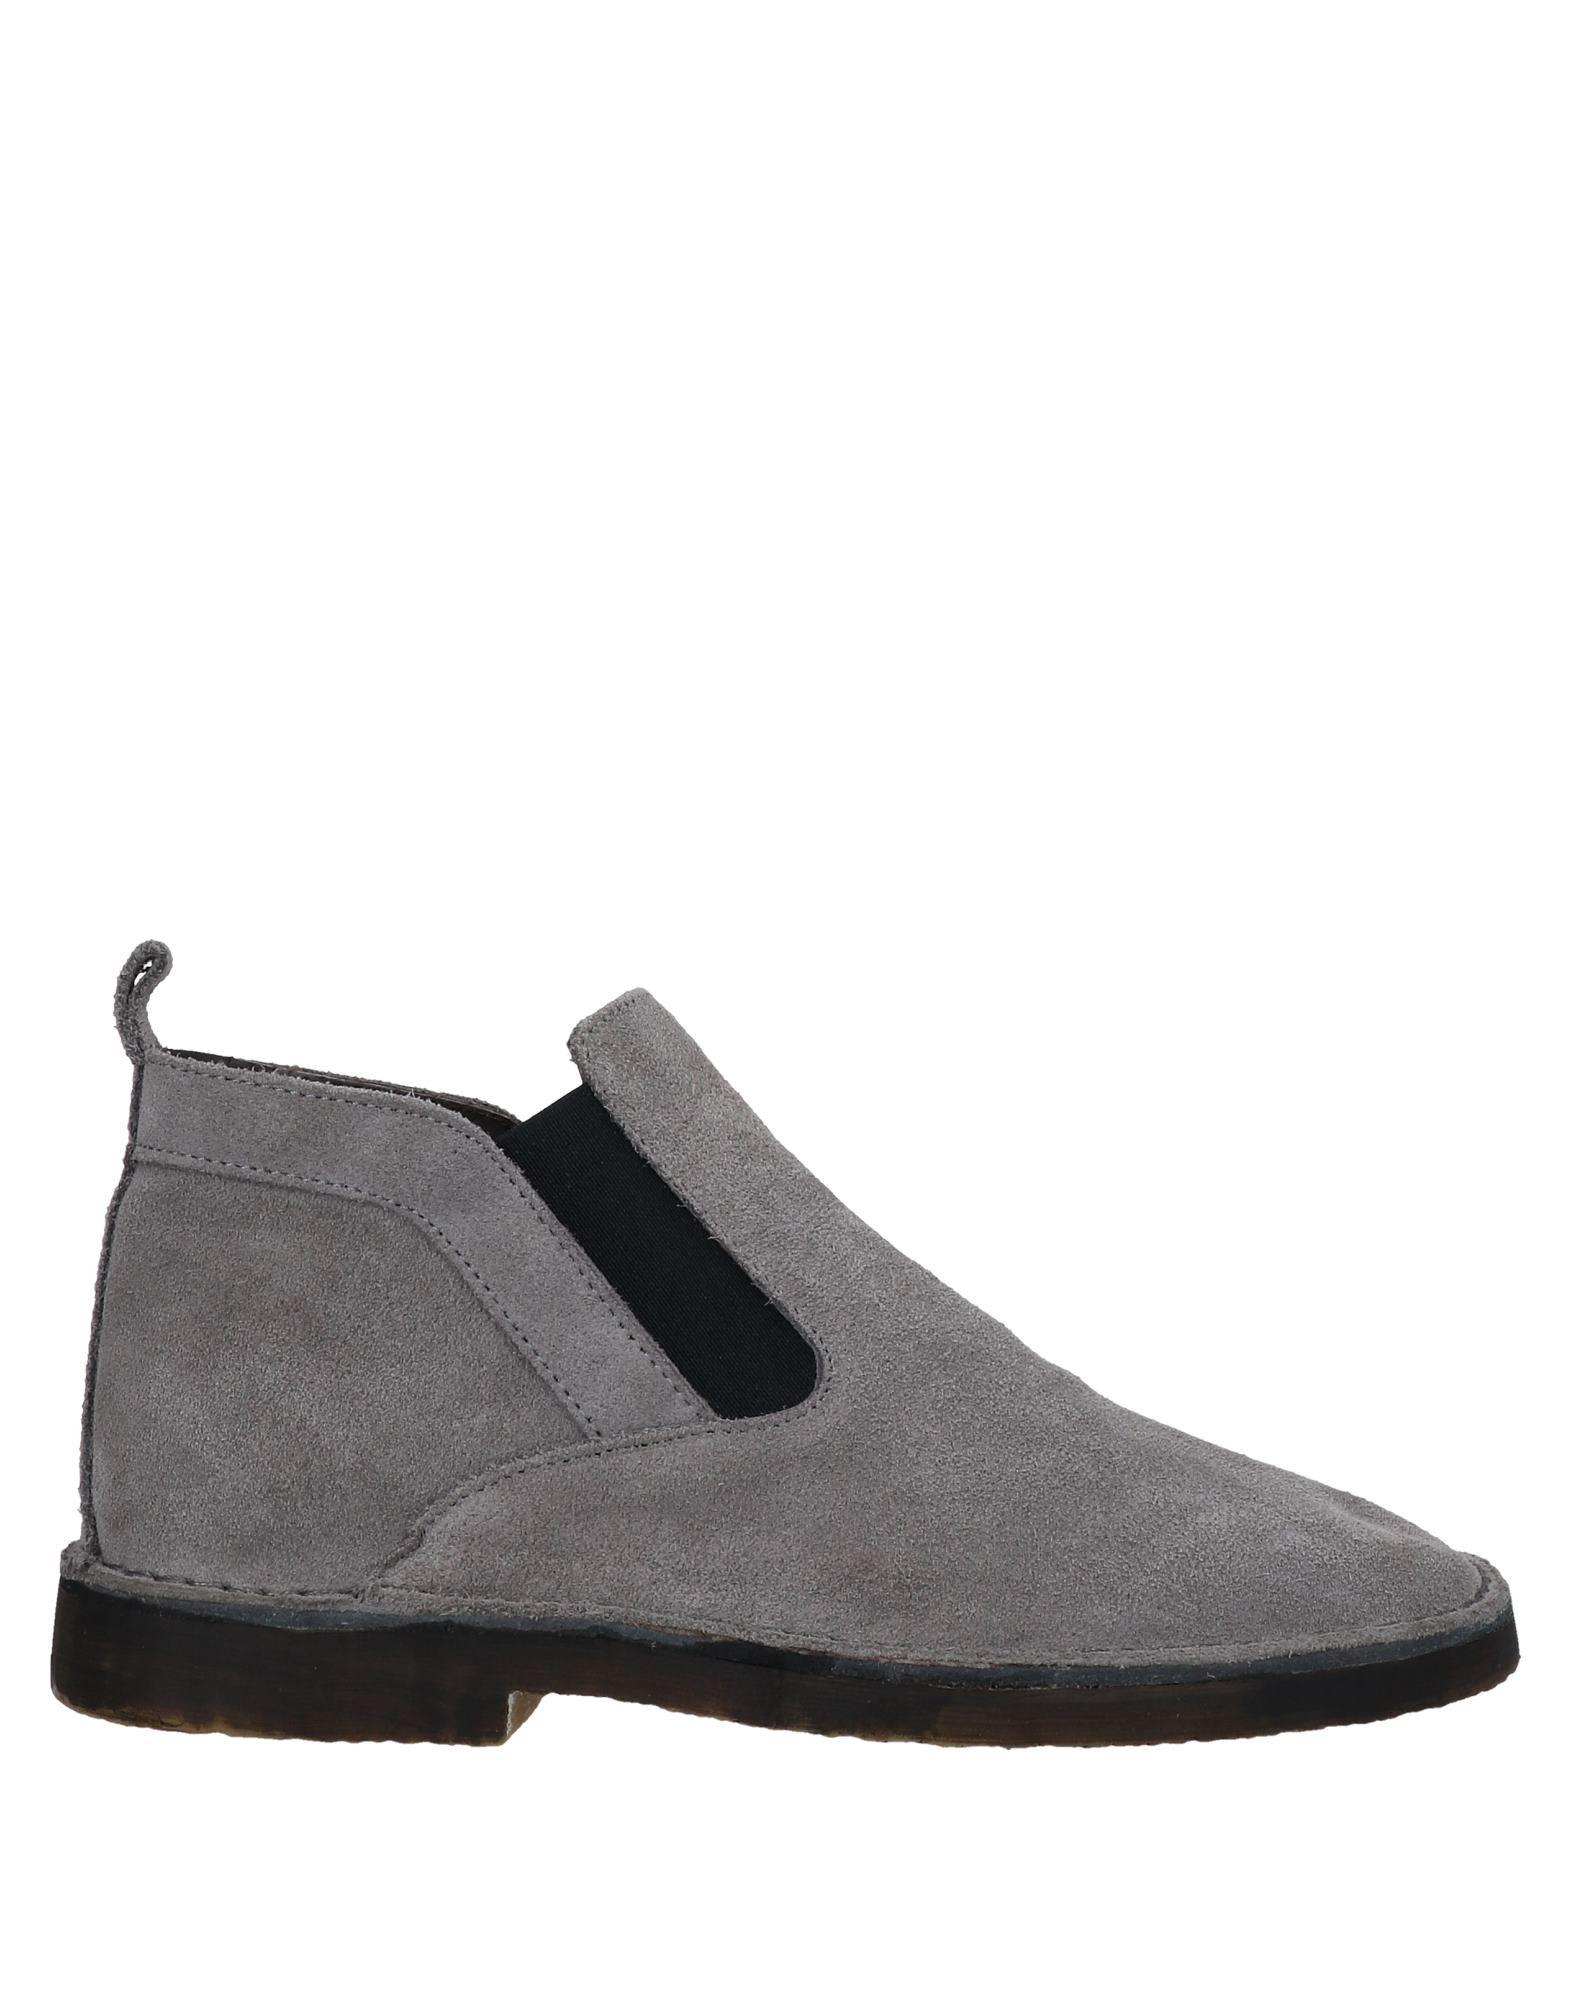 GREY DANIELE ALESSANDRINI Полусапоги и высокие ботинки grey daniele alessandrini высокие кеды и кроссовки